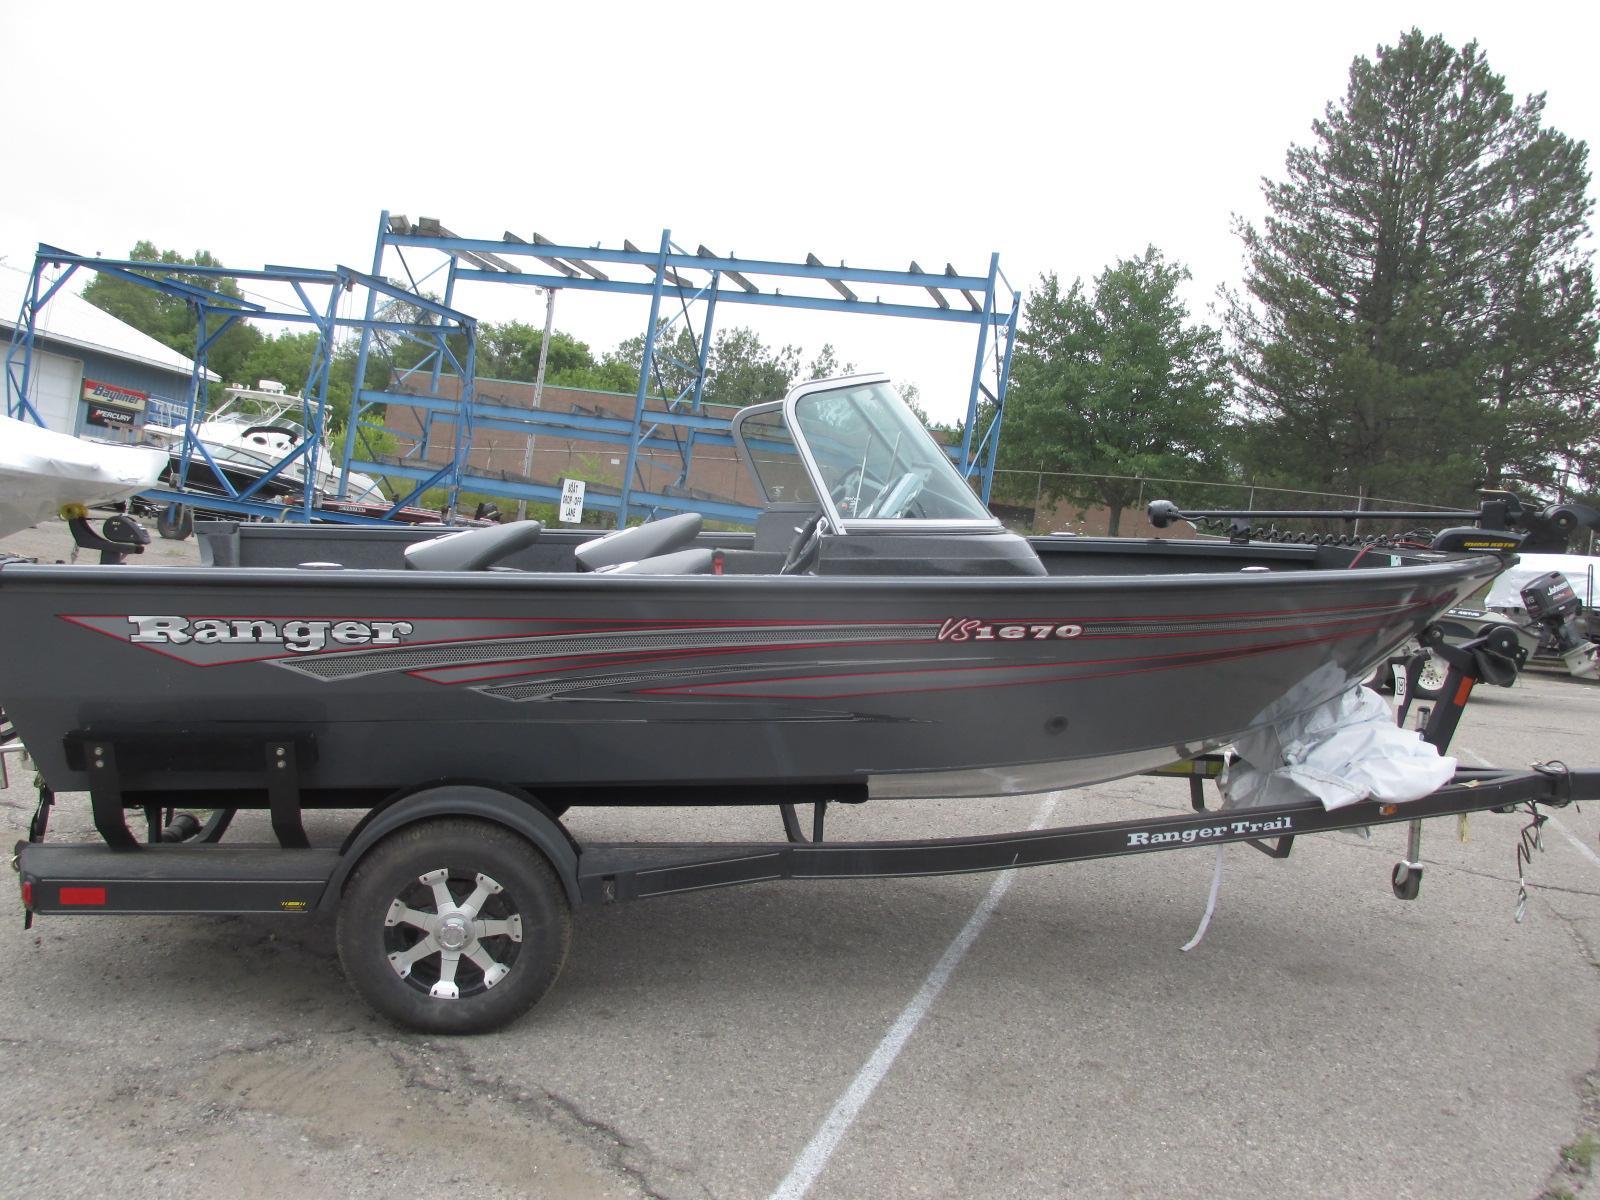 RangerVS1670WT